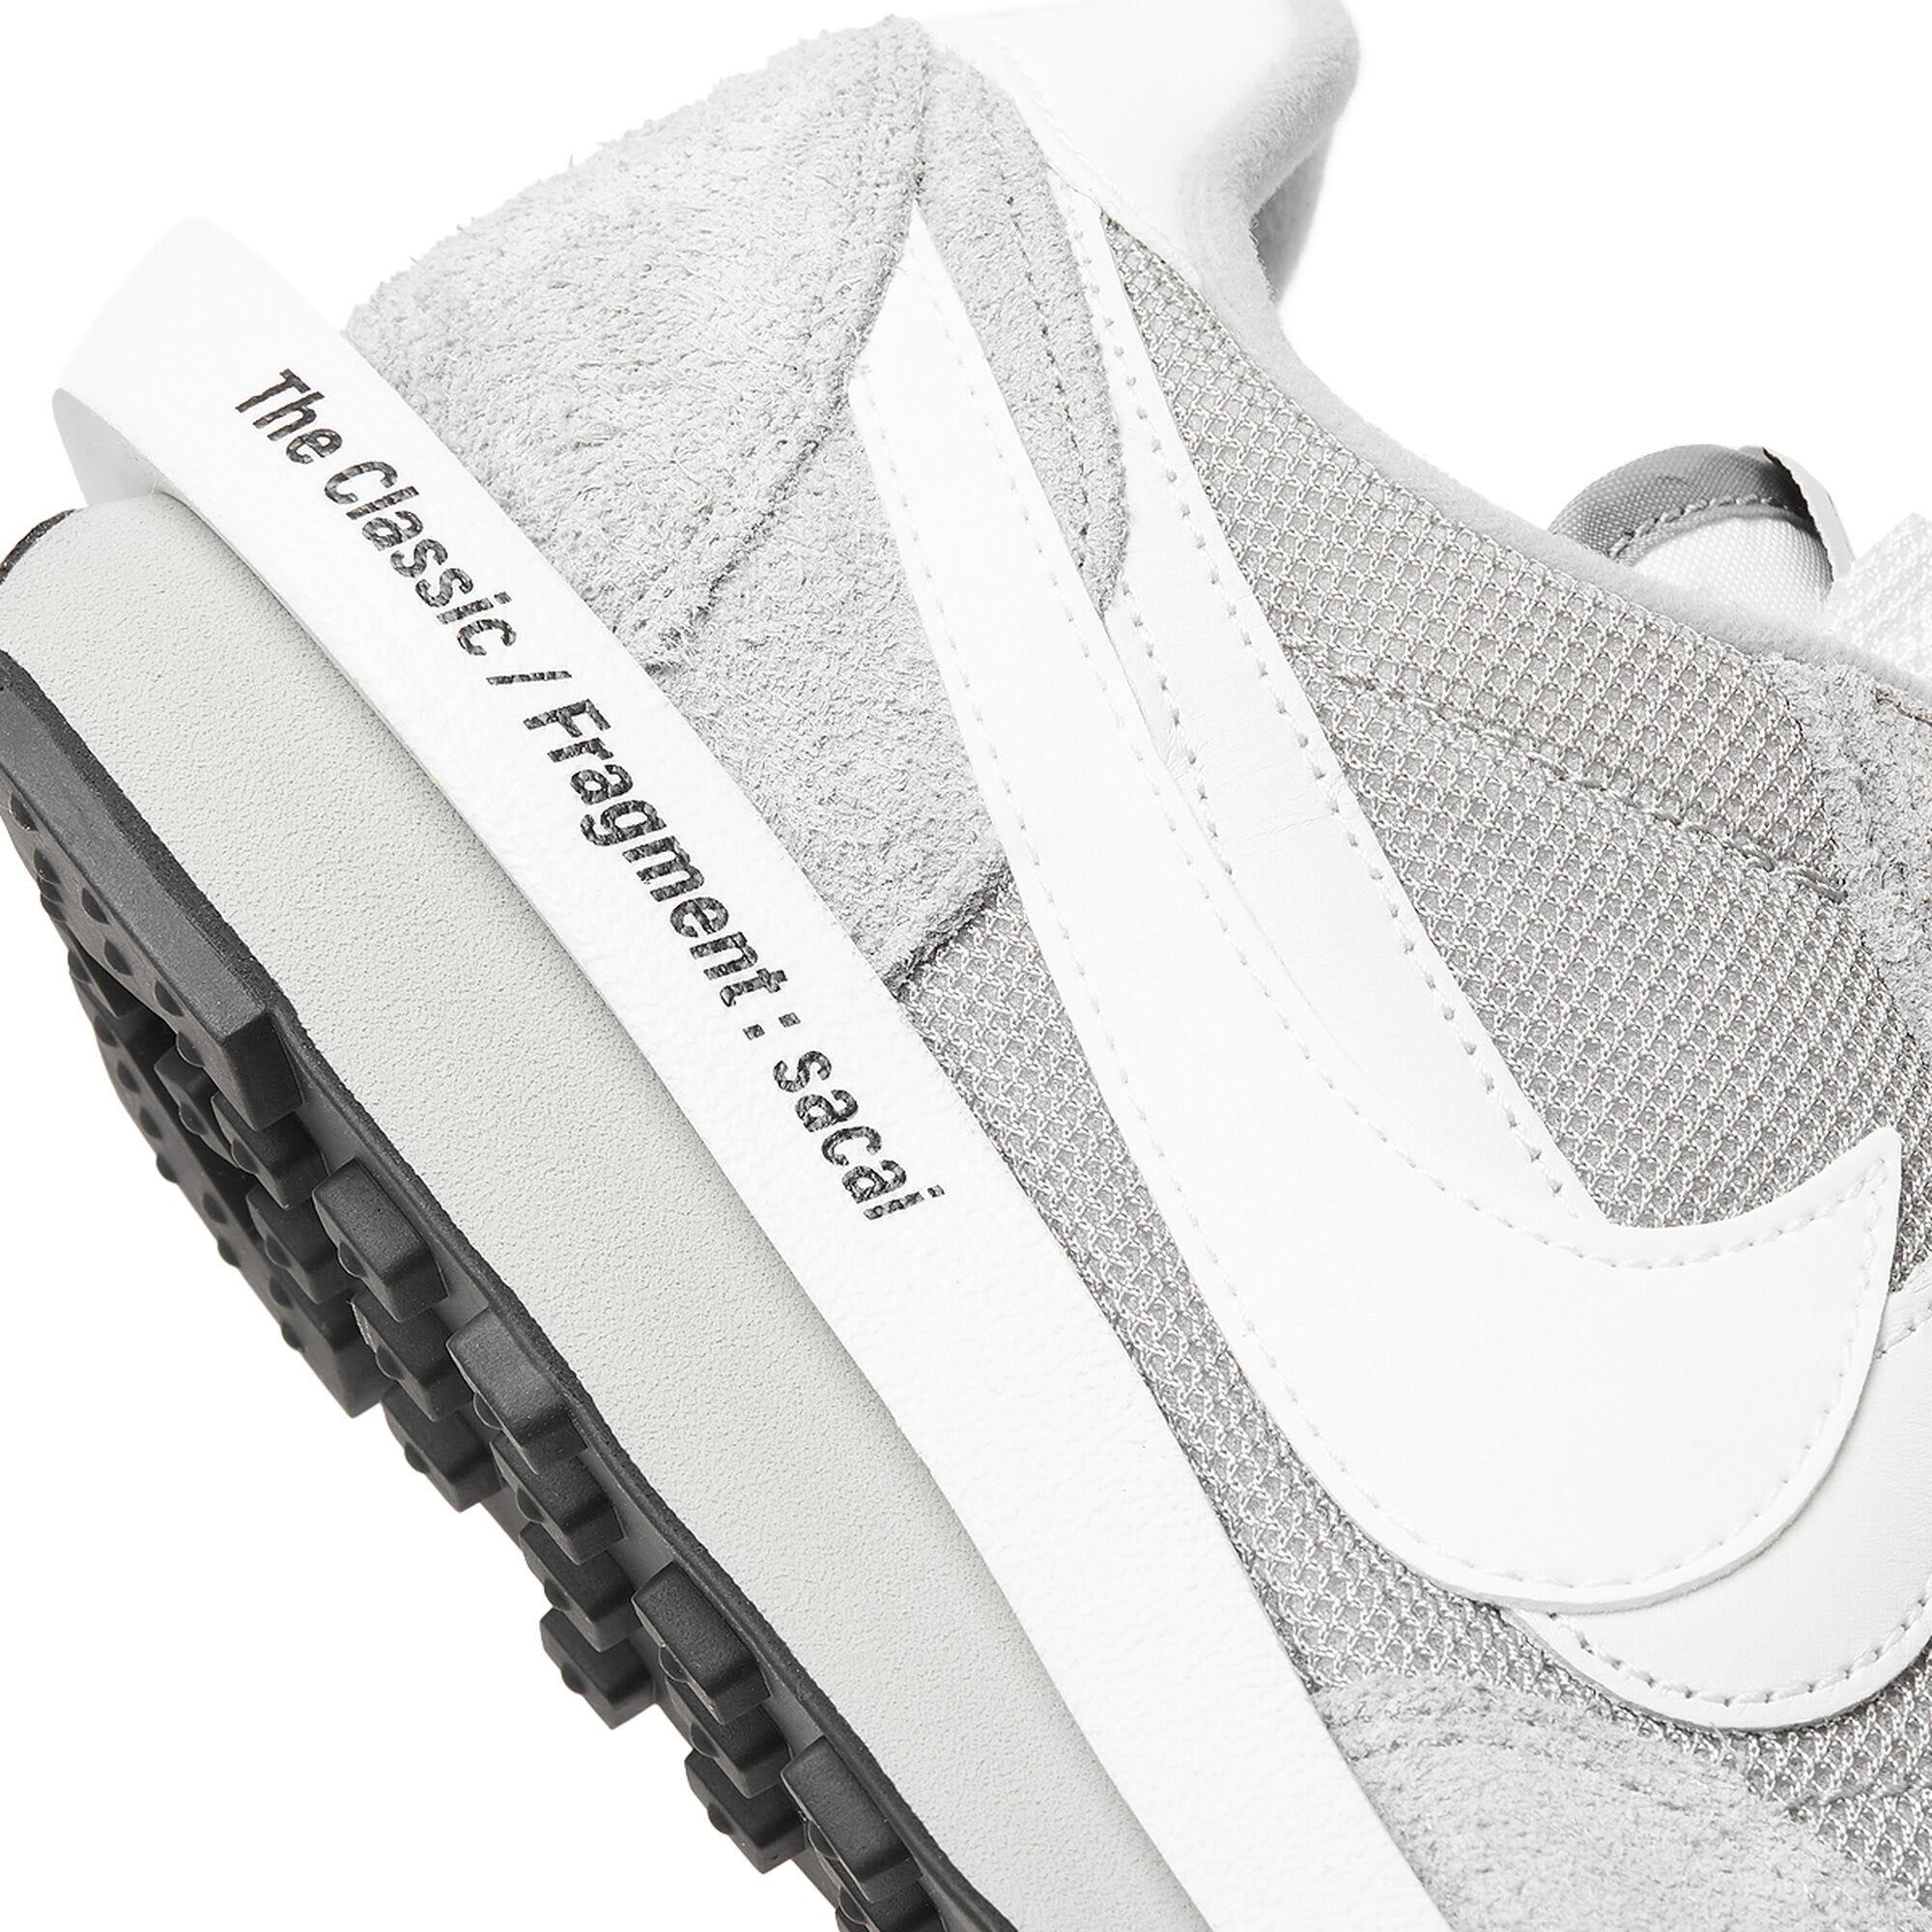 Fragment x Sacai x Nike LDWaffle 'Grey' DH2684-001 Side